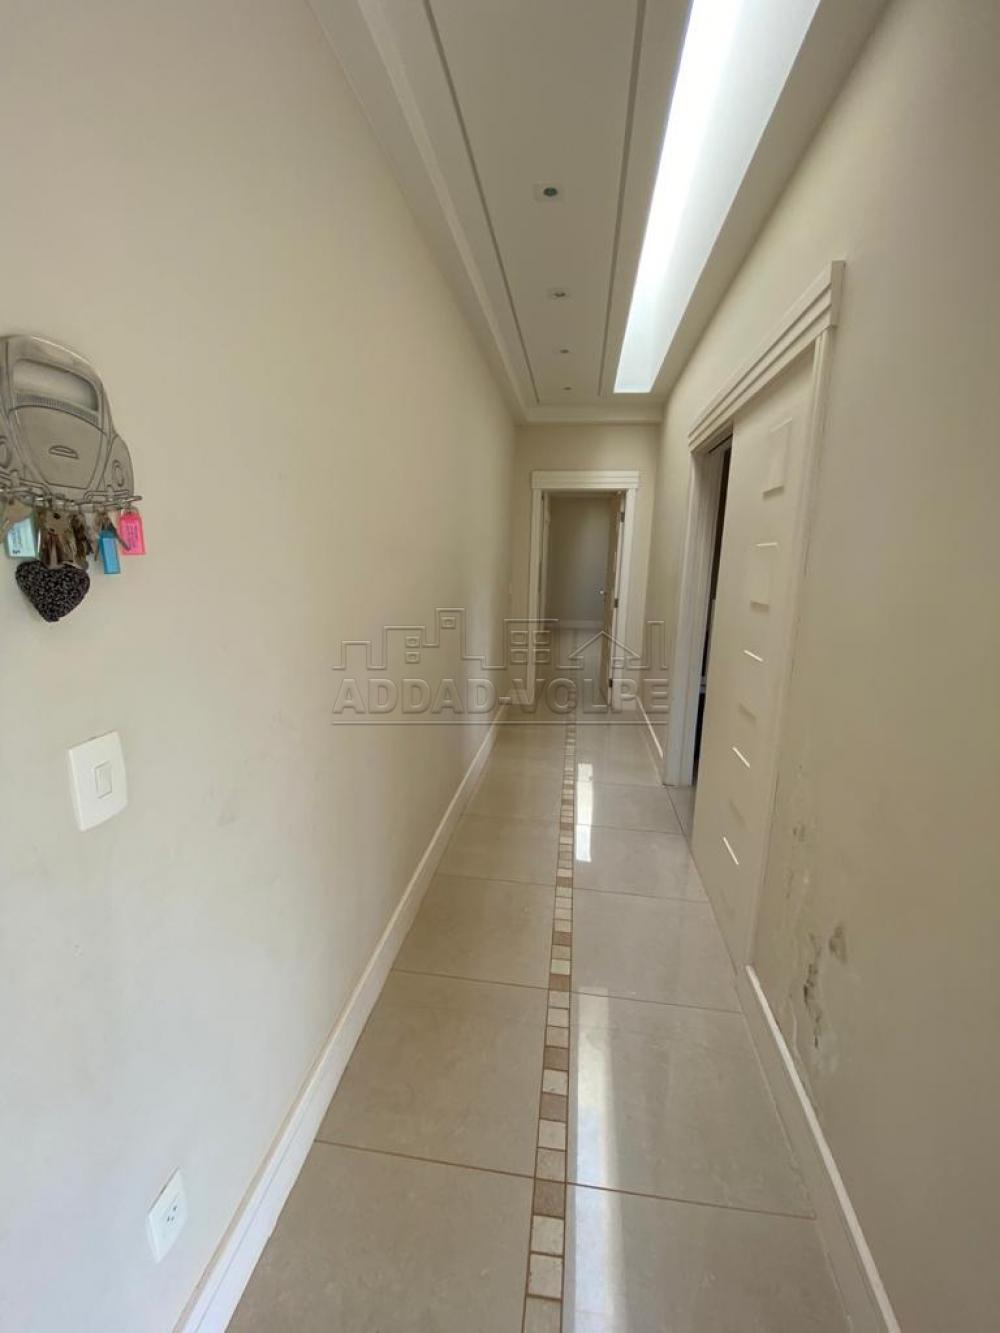 Comprar Casa / Condomínio em Bauru apenas R$ 1.800.000,00 - Foto 5